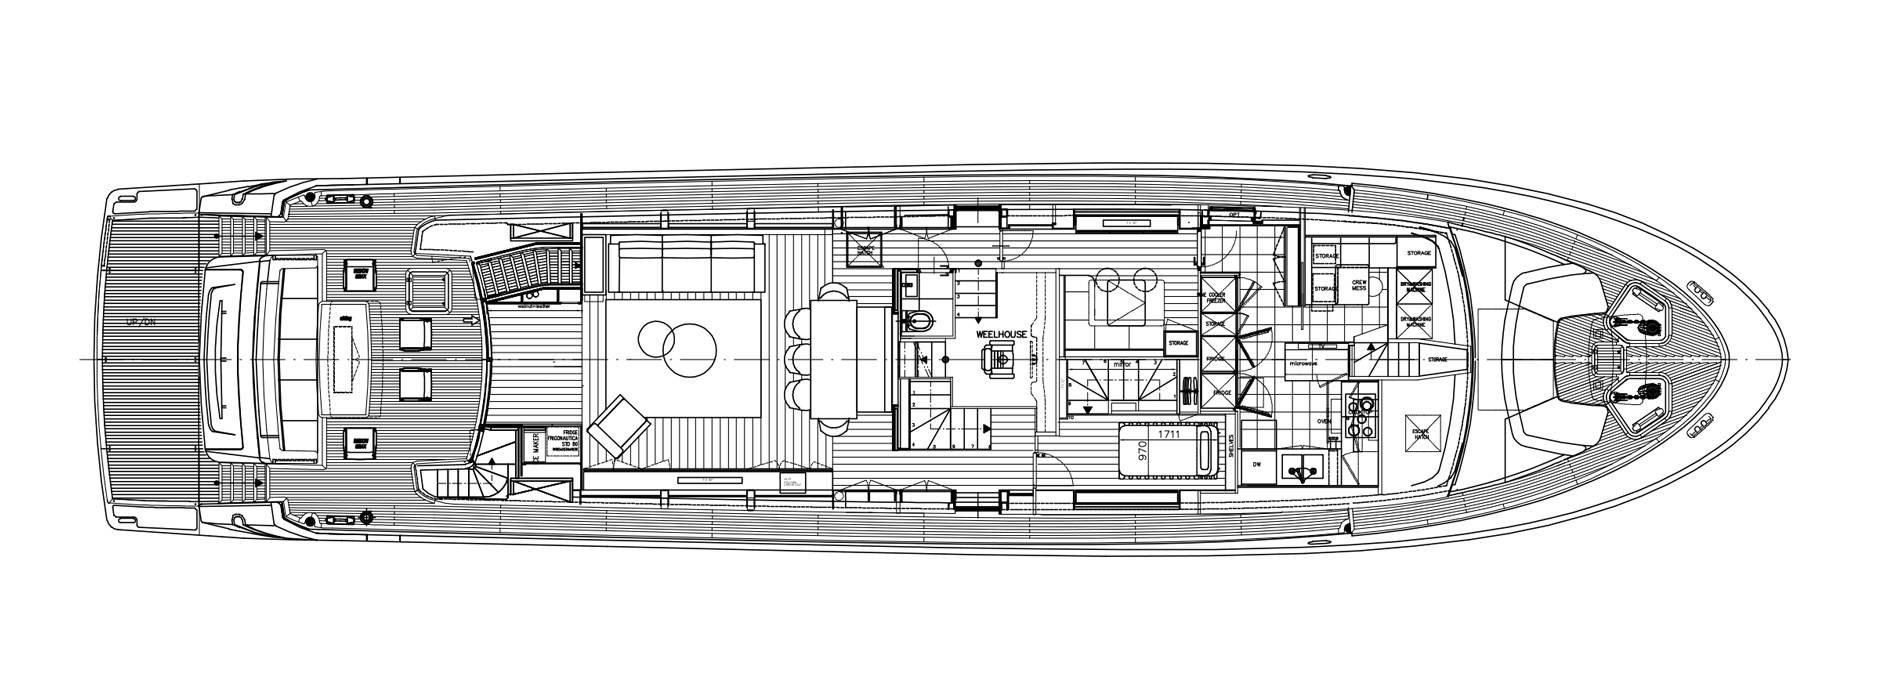 Sanlorenzo Yachts SL96-623 主甲板